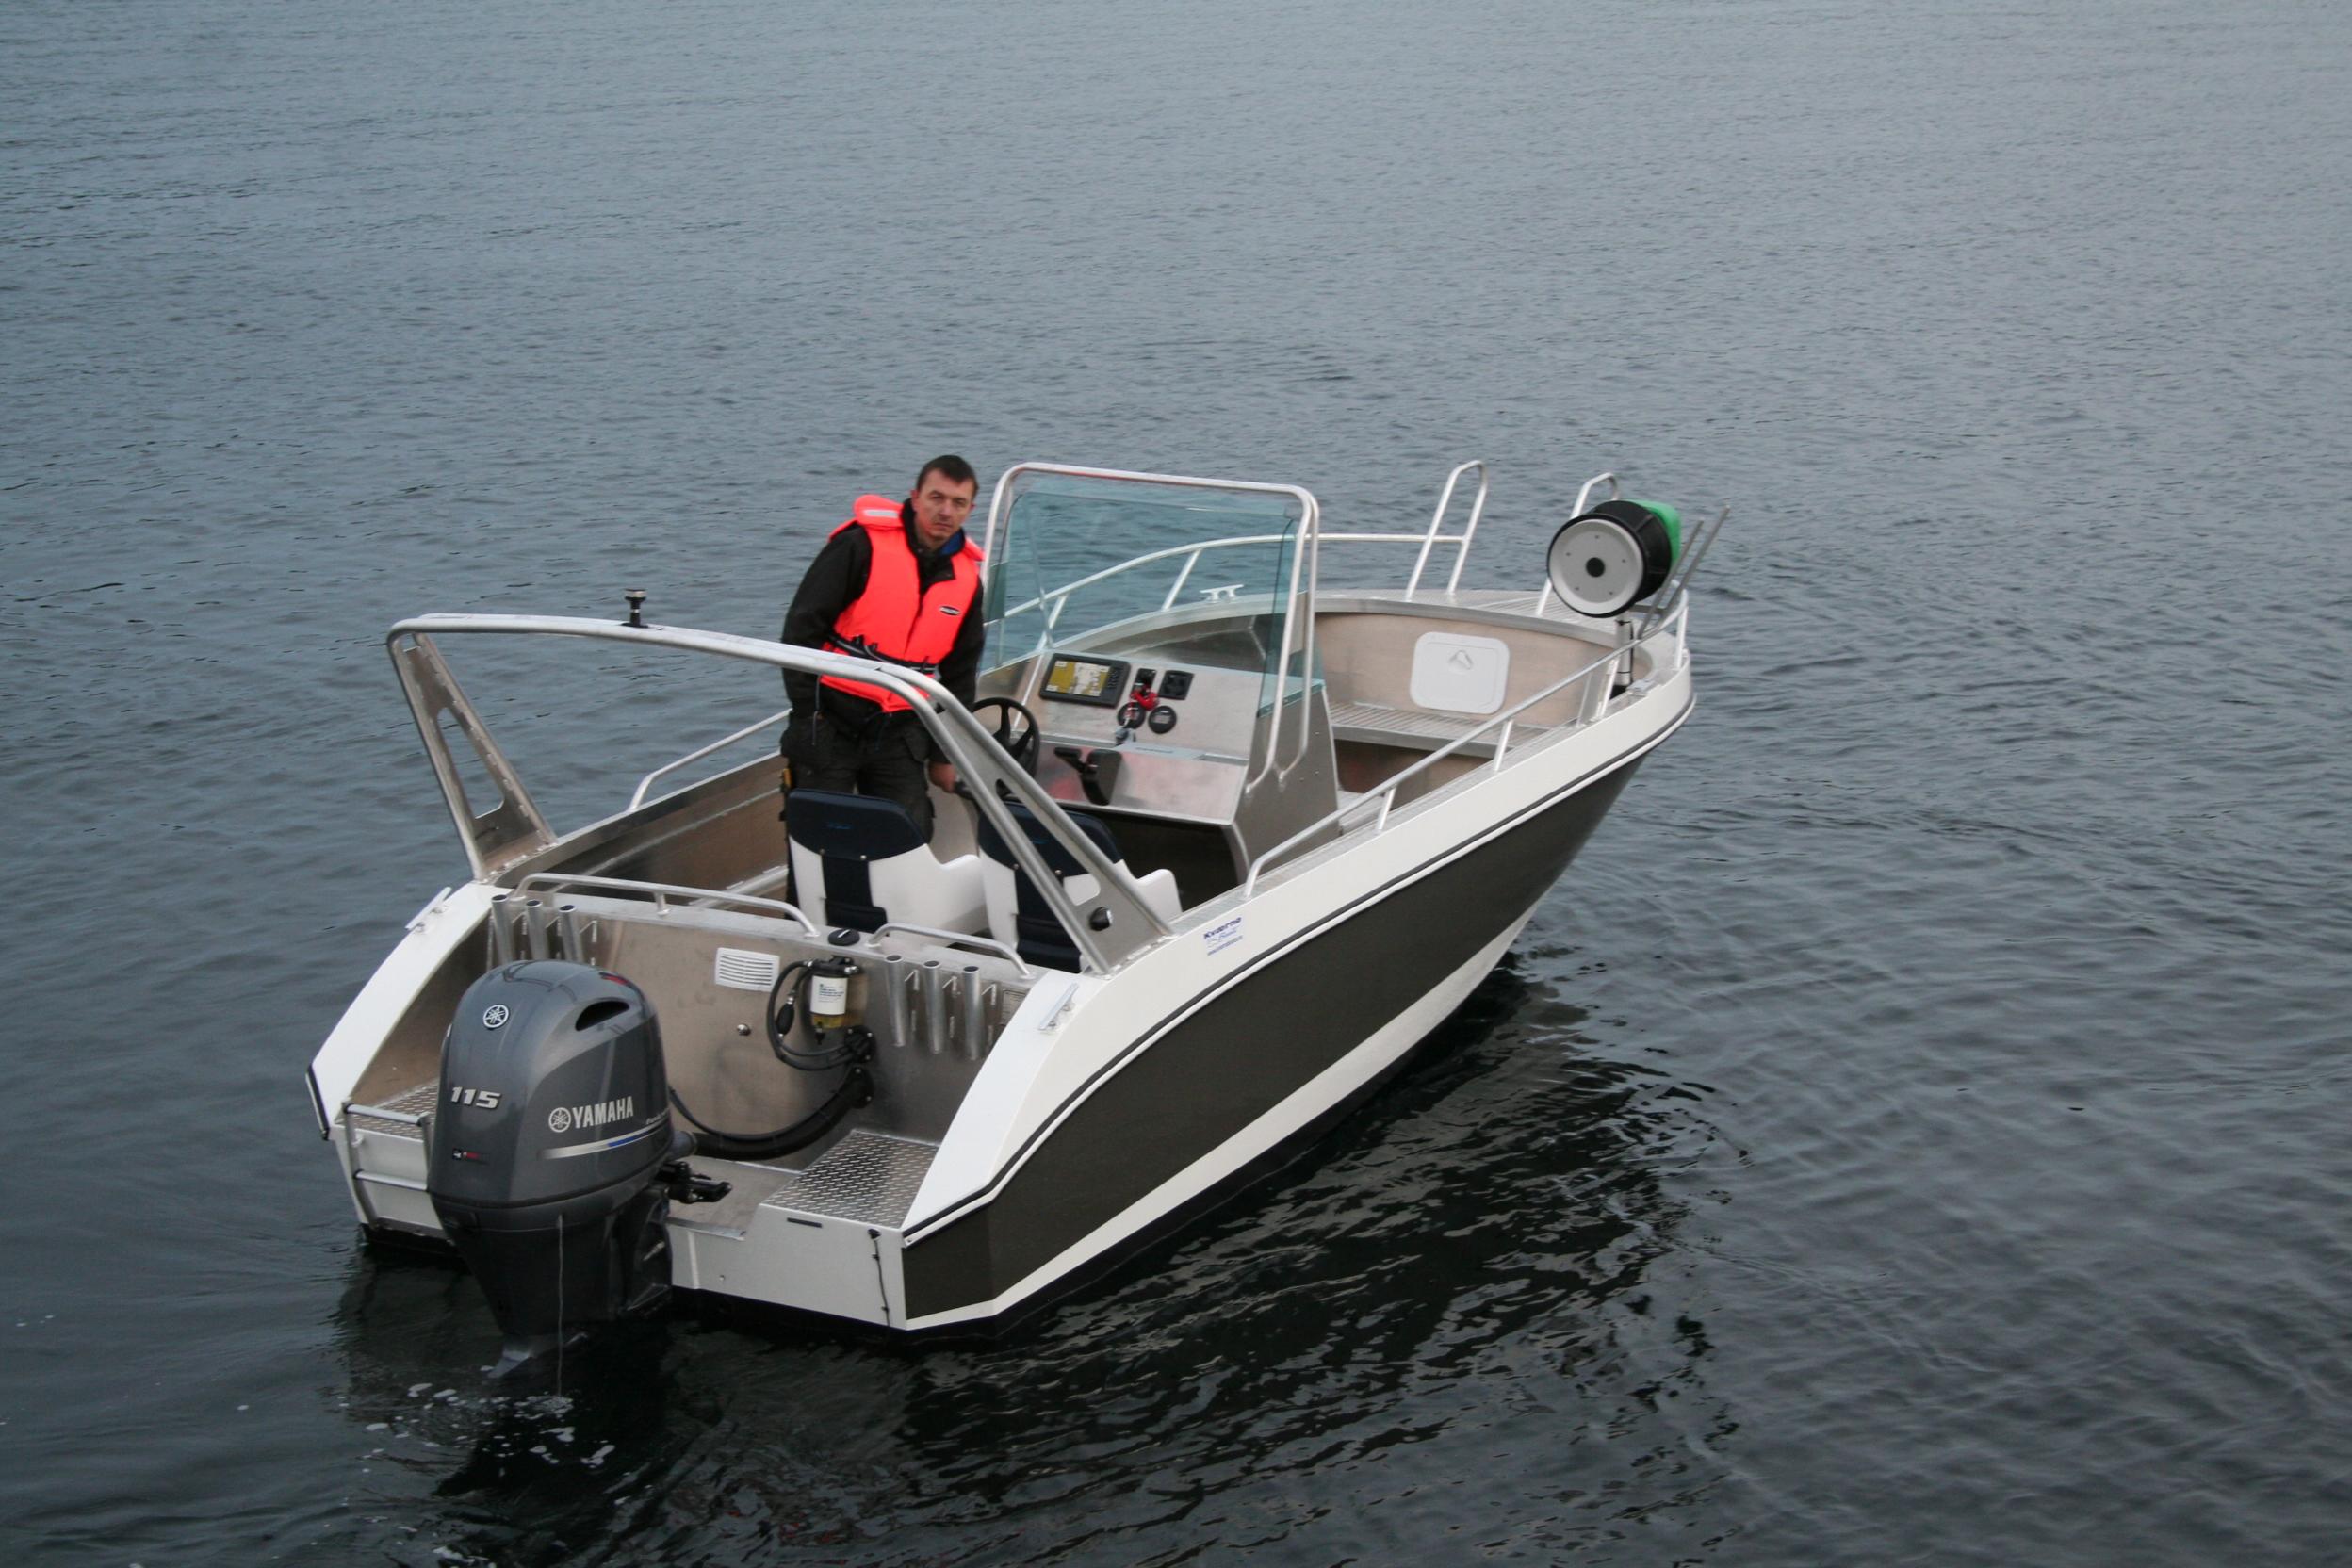 kværnø boat